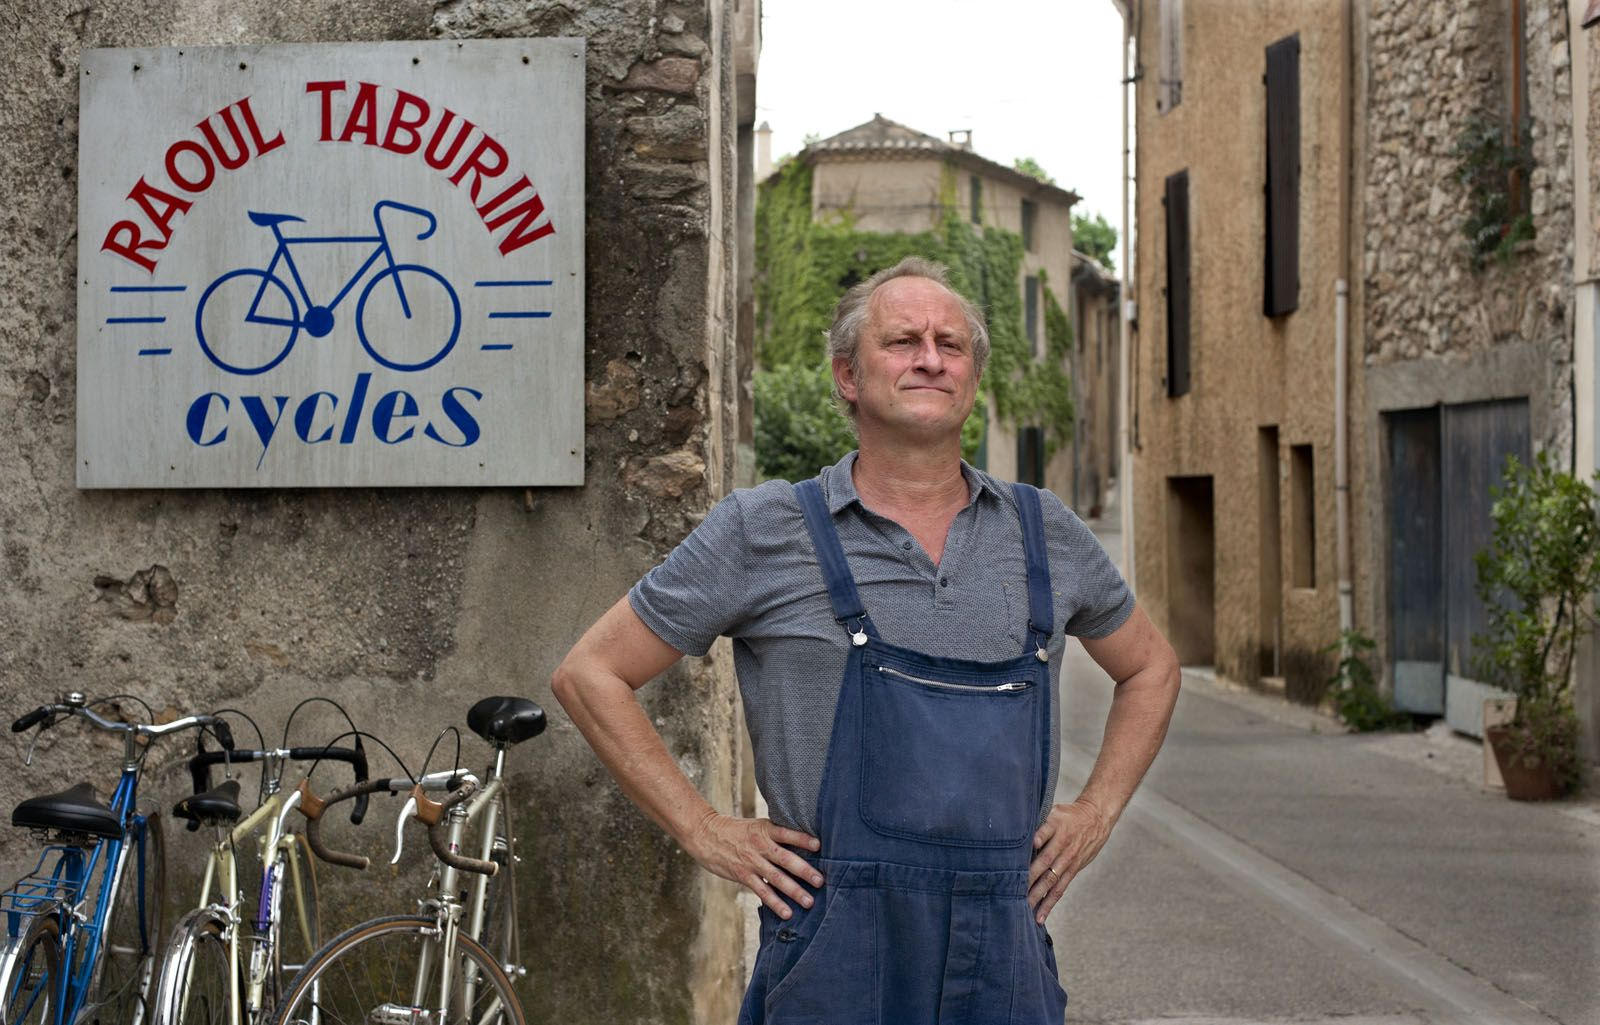 Benoît Poelvoorde en pleine forme pour la promo de Raoul Taburin